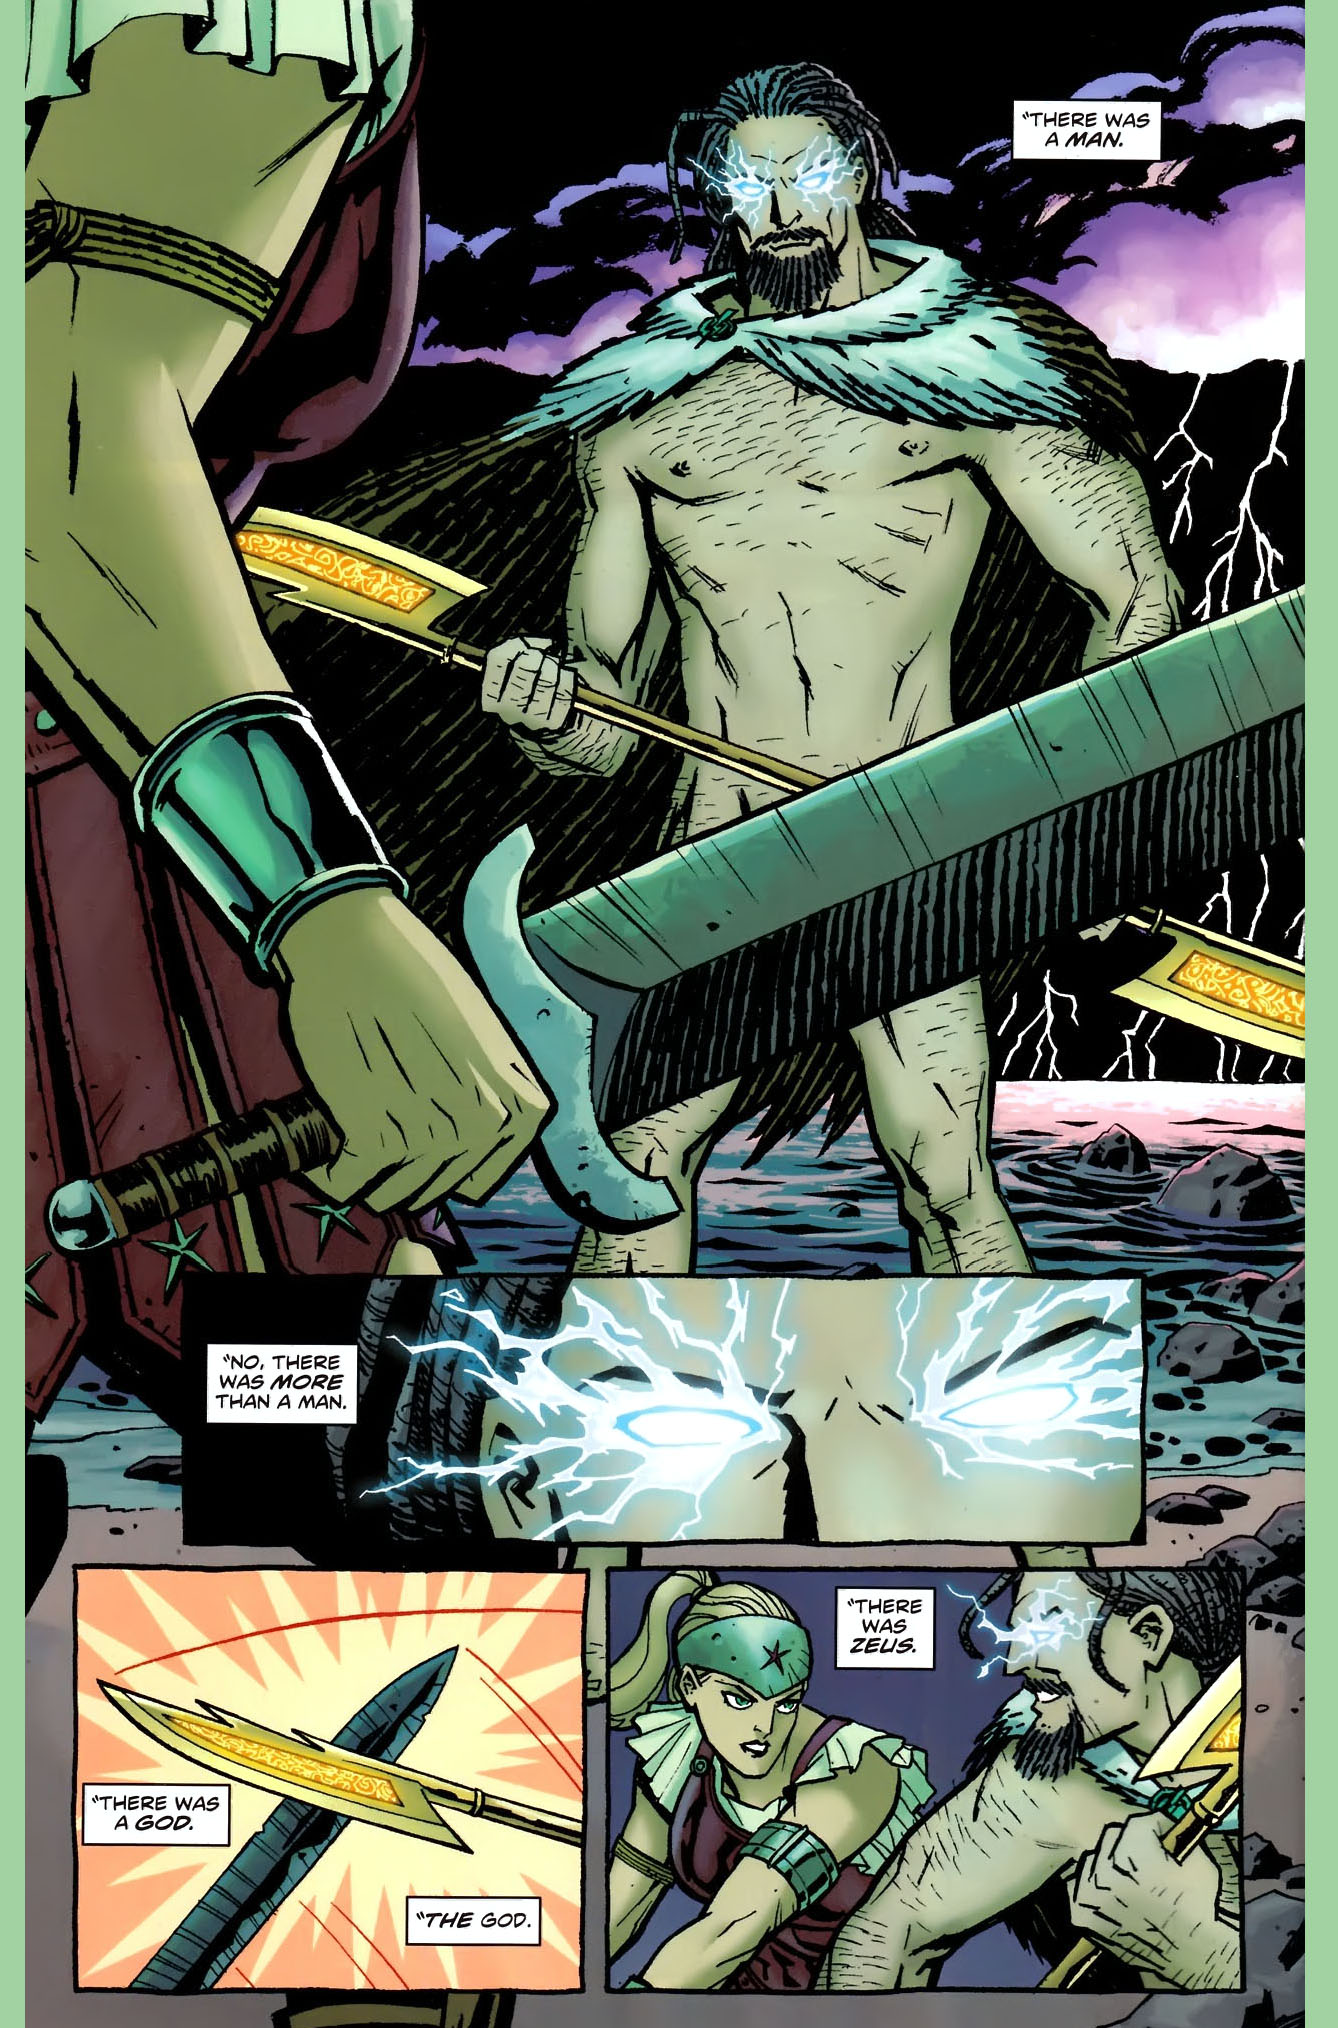 Wonder Woman's New 52 Origin Story 1